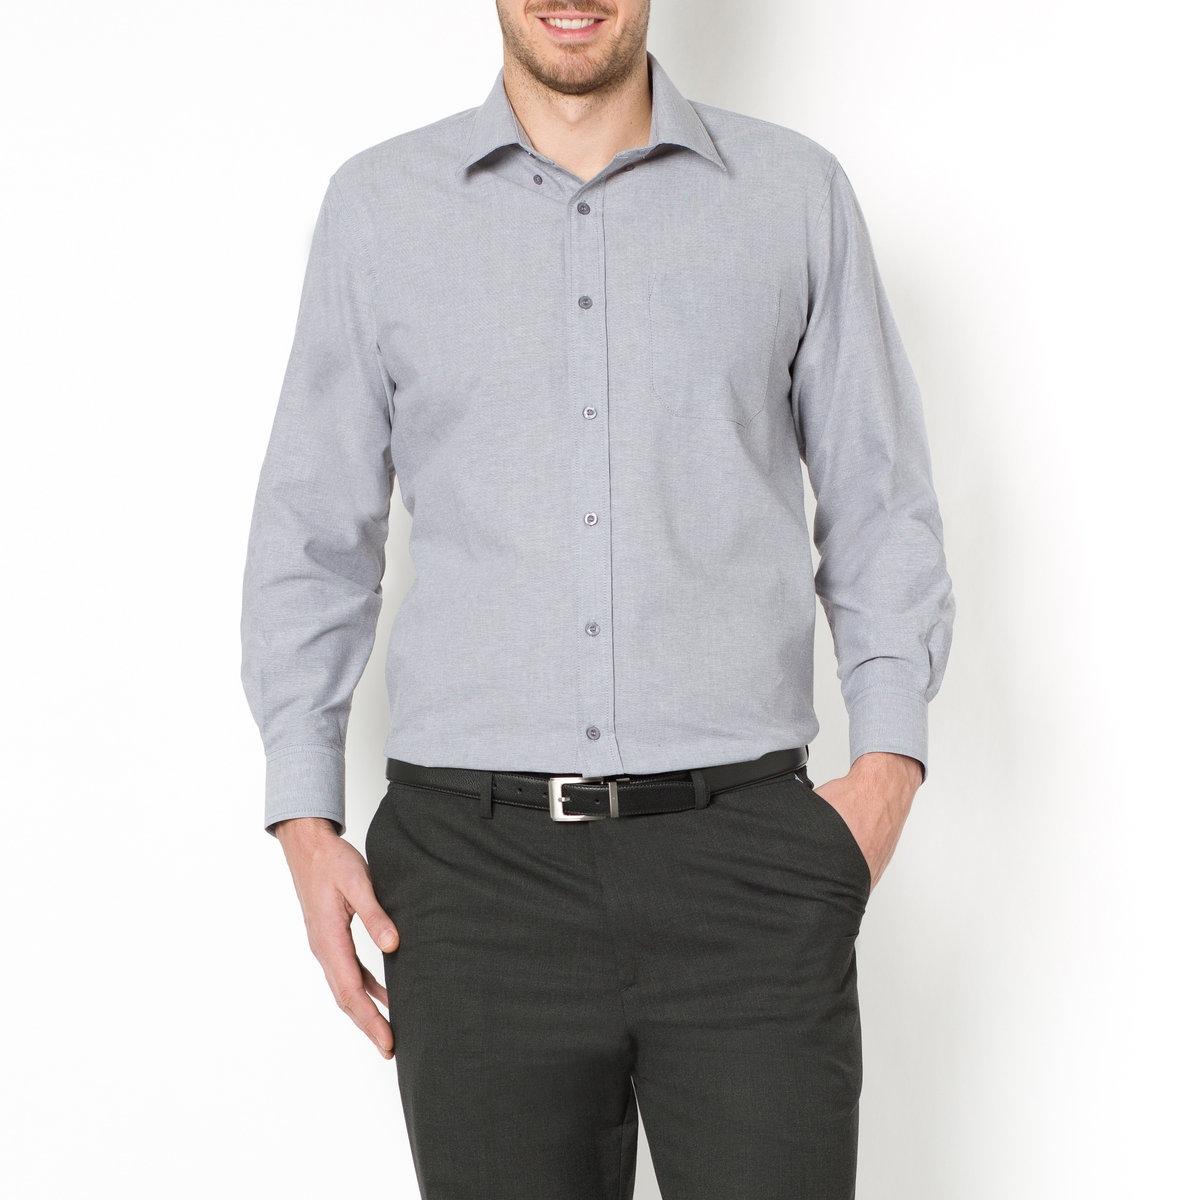 Хлопковая рубашка от La Redoute